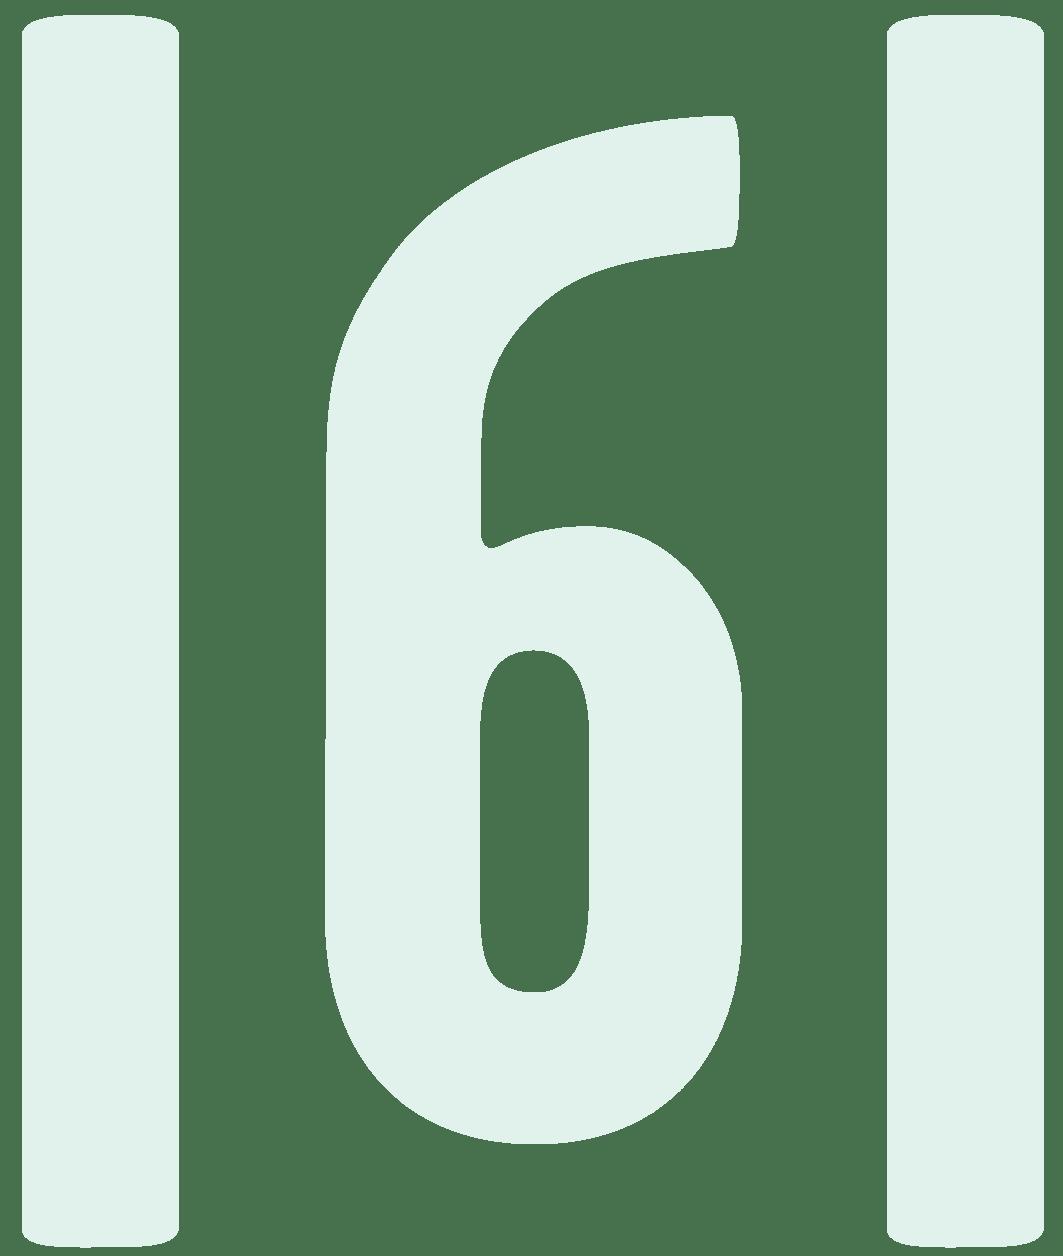 6-02-01-01-01